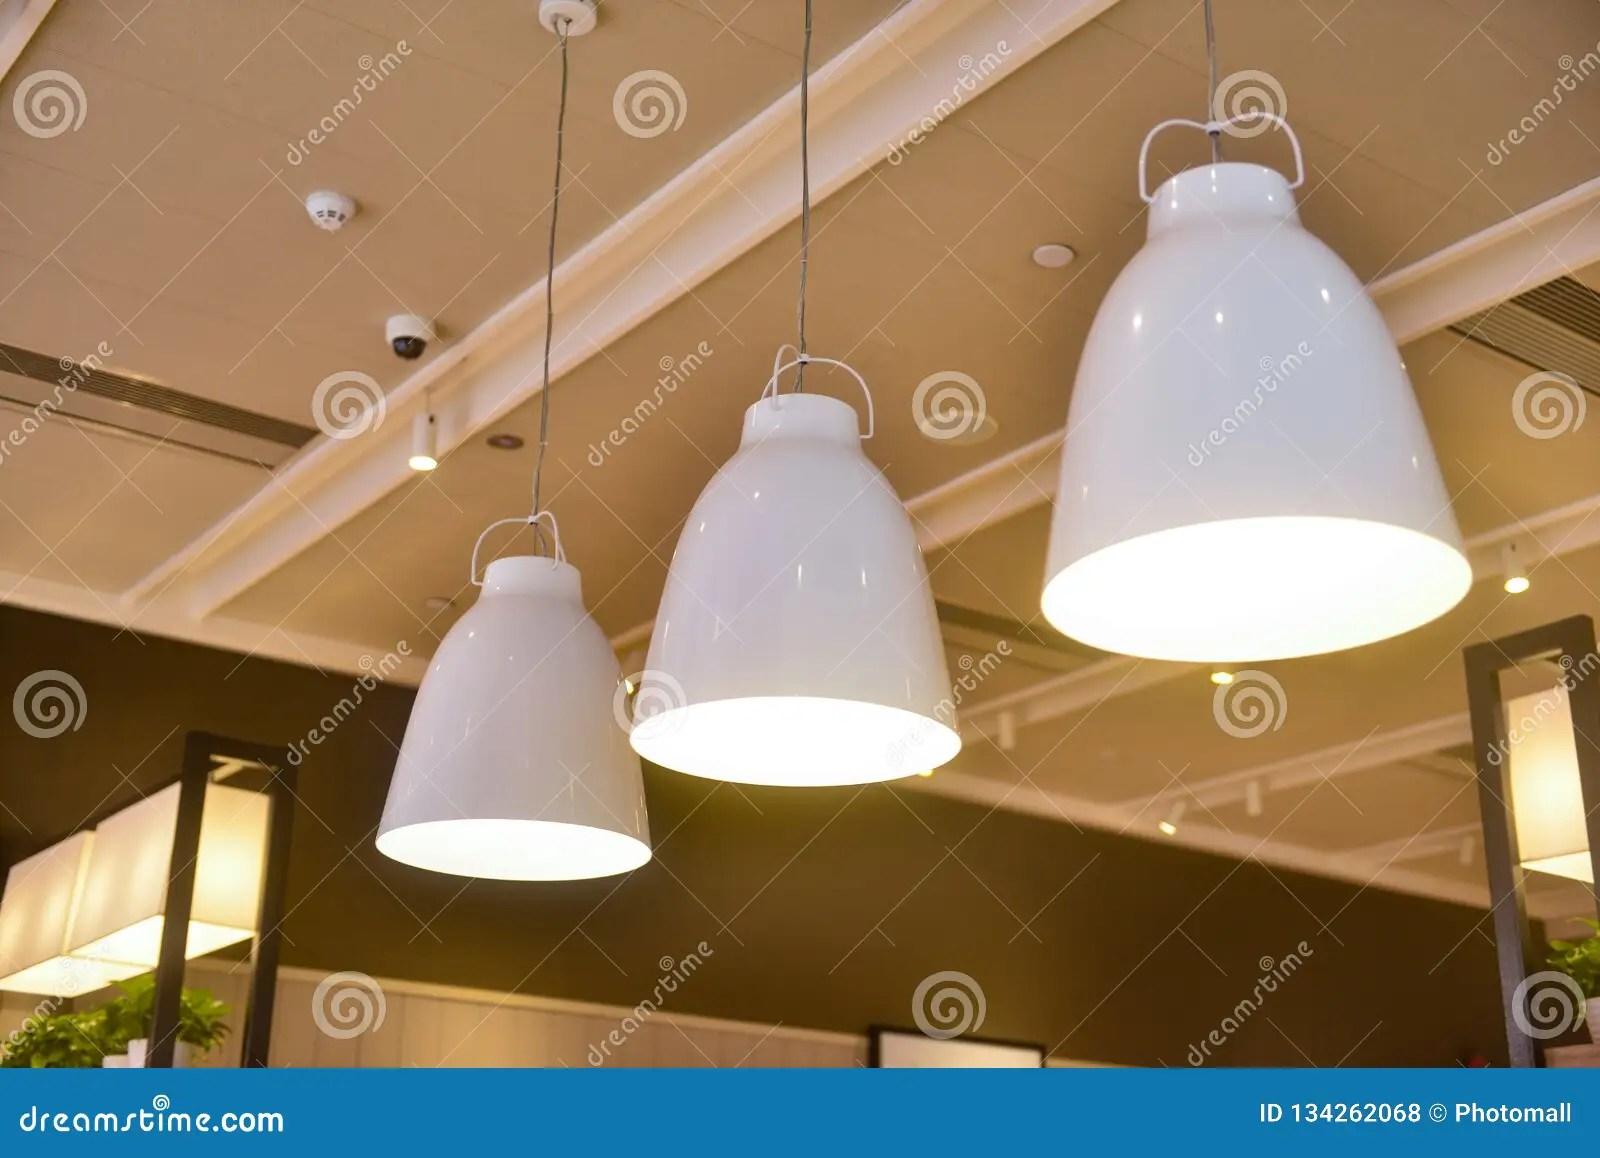 https www dreamstime com led hanging lighting commercial building modern pendant restaurant image134262068